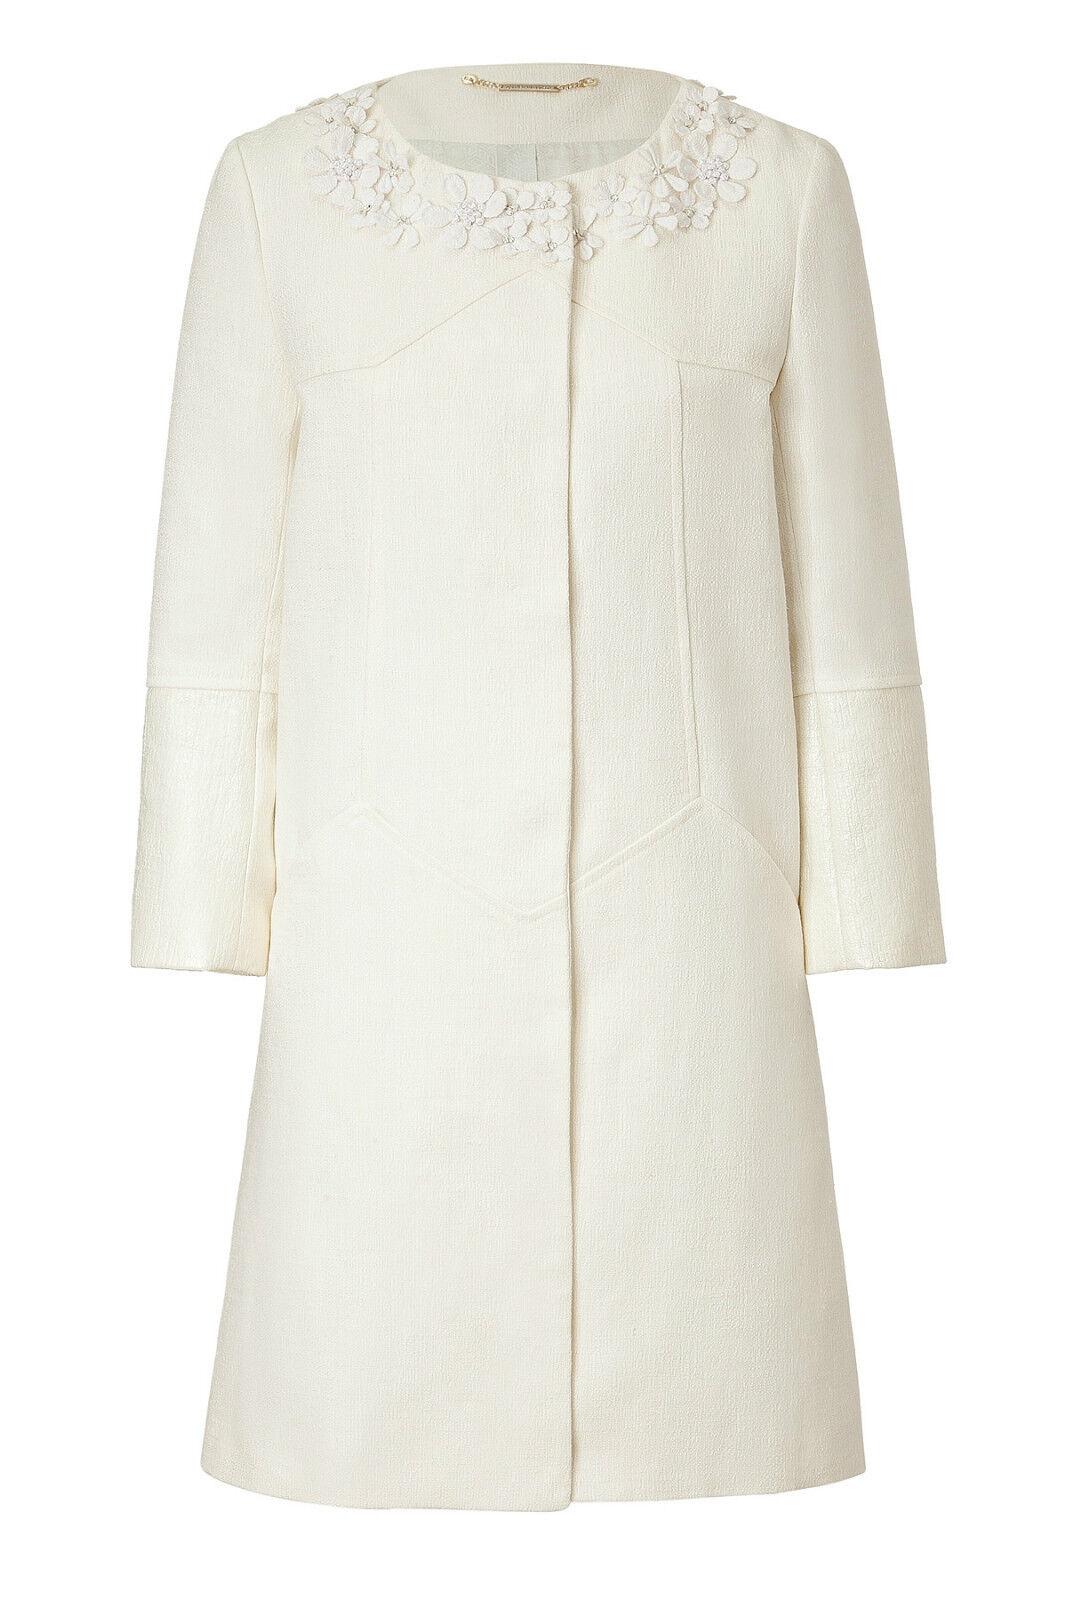 Matthew Williamson  Cotton Linen Embellished Collar Ivory Coat rrp  1,900 14  lo último